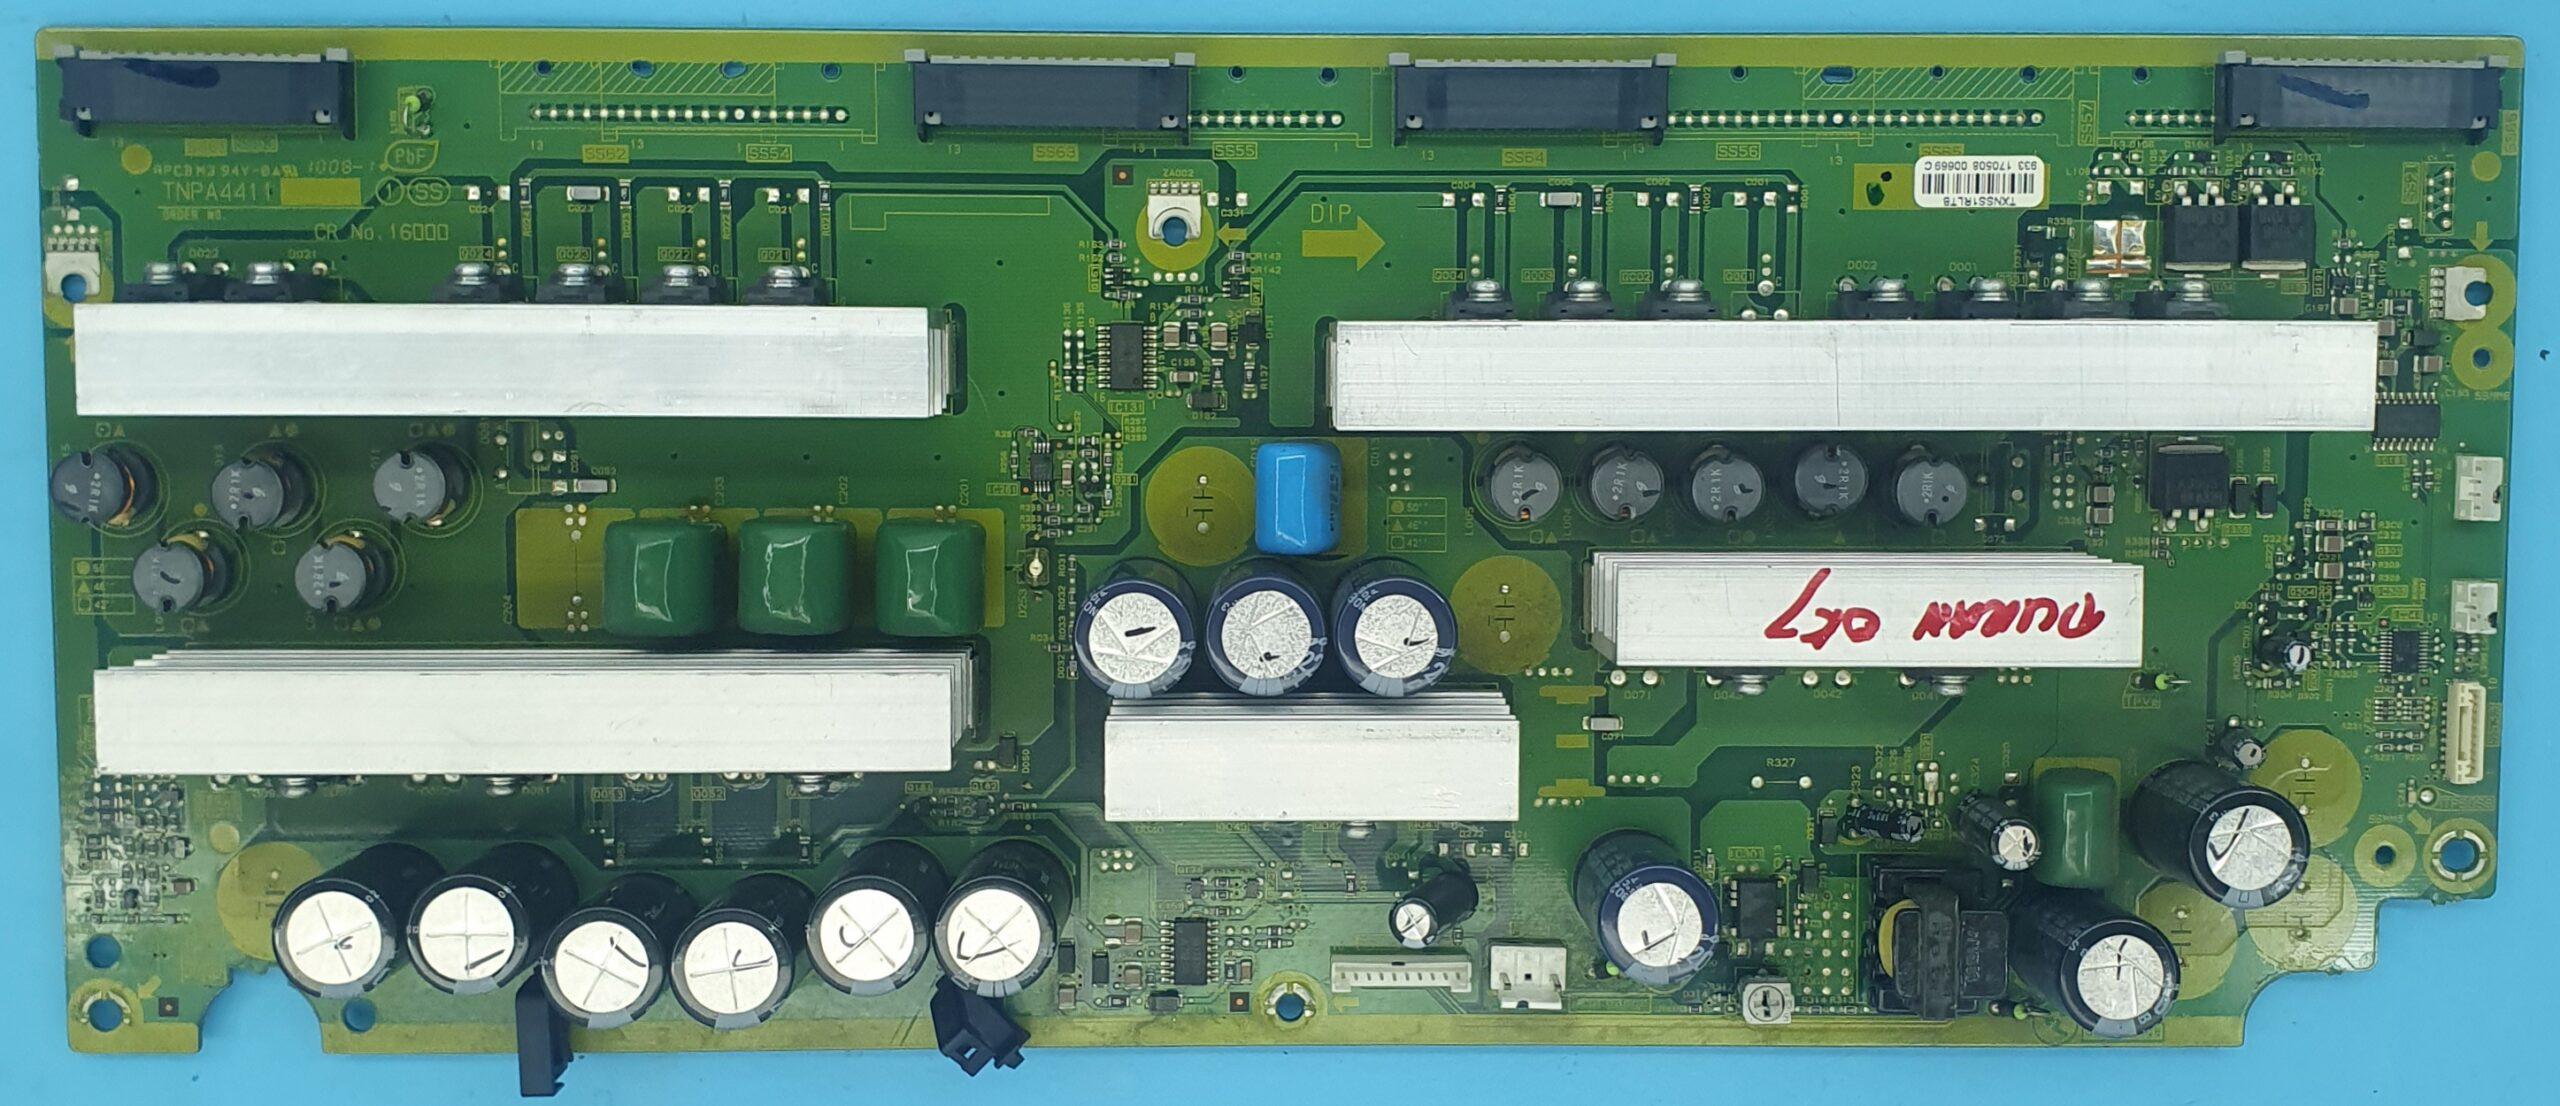 TNPA4411 Panasonic Z-SUS (KDV DAHİL = 130 TL)